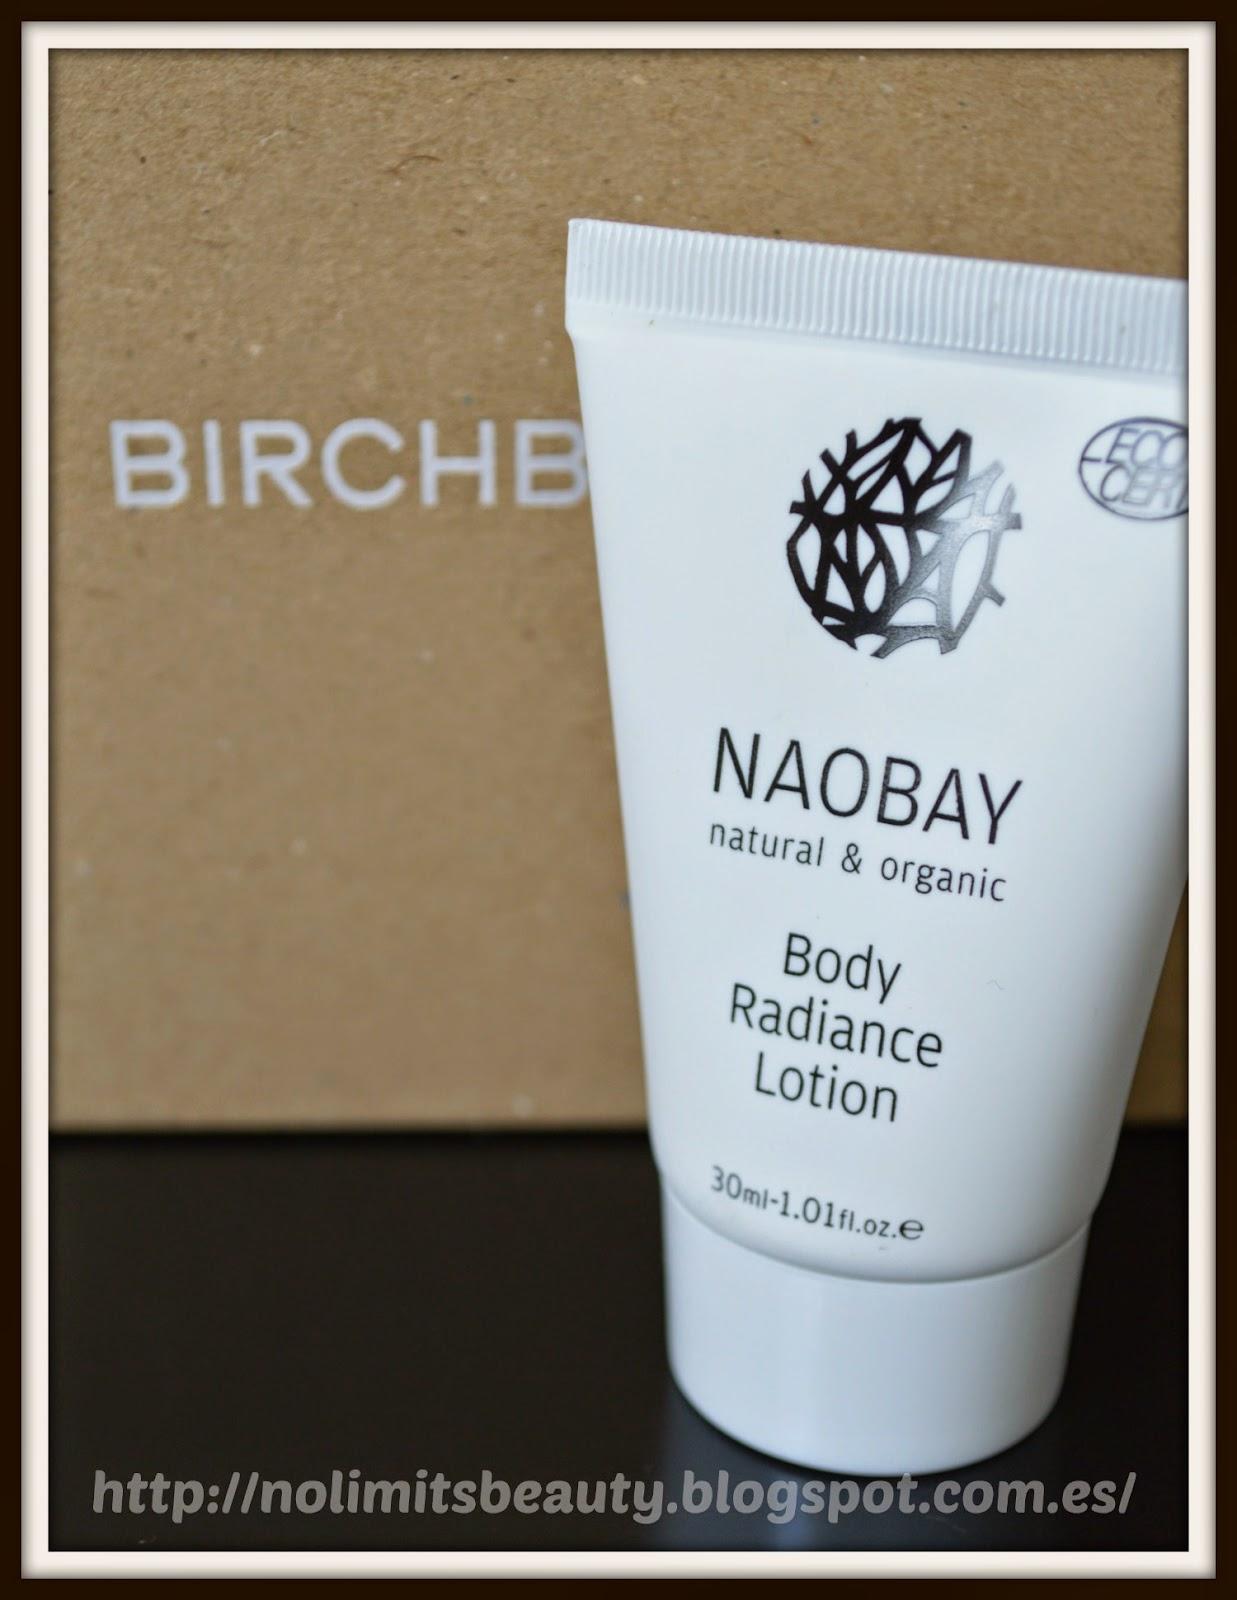 BirchBox Abril 2014 - Body Radiance Lotion de Naobay